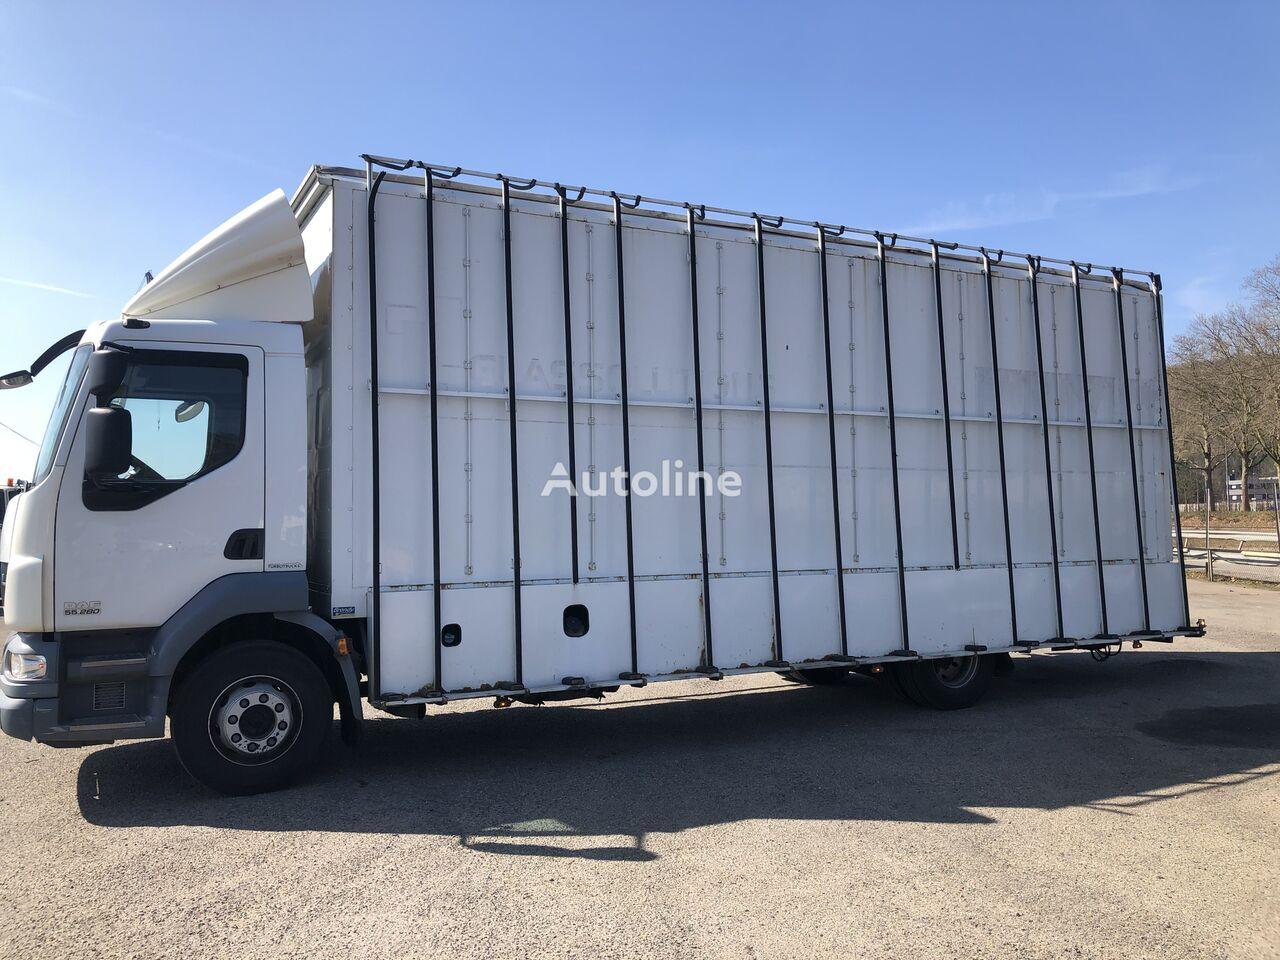 DAF LF 55.280 glass transport truck